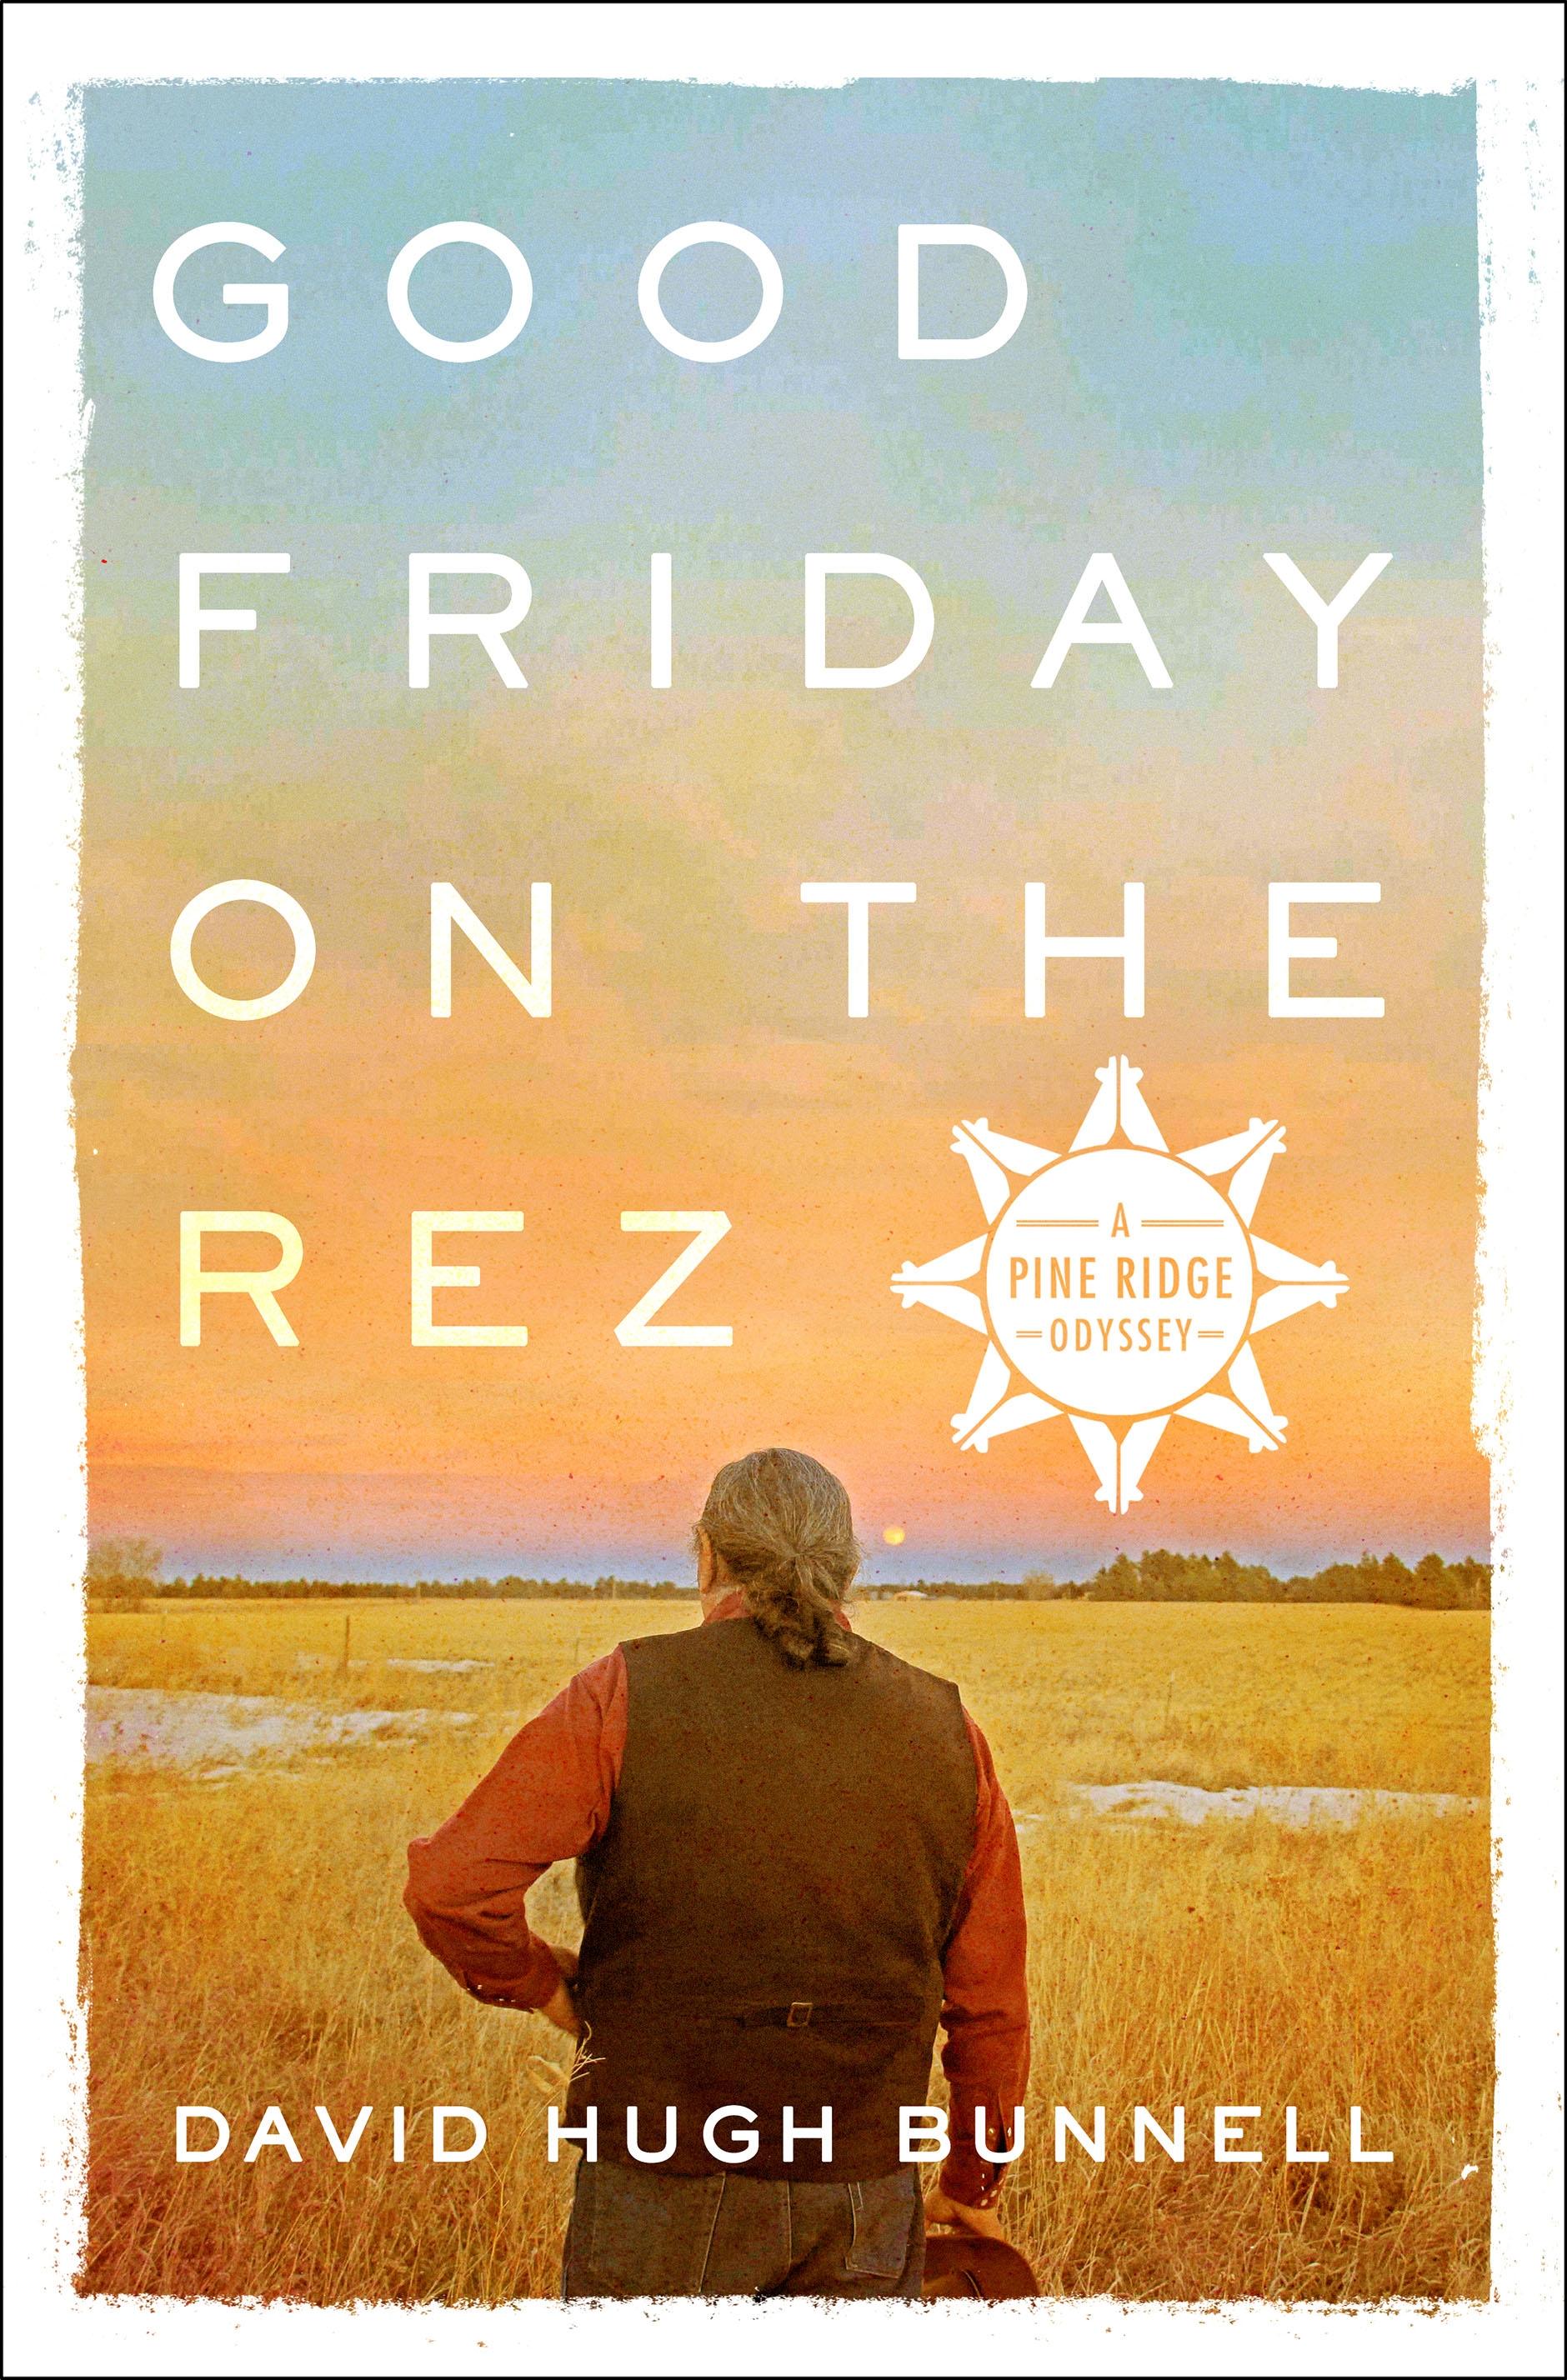 Good Friday on the rez [eBook] : a Pine Ridge odyssey